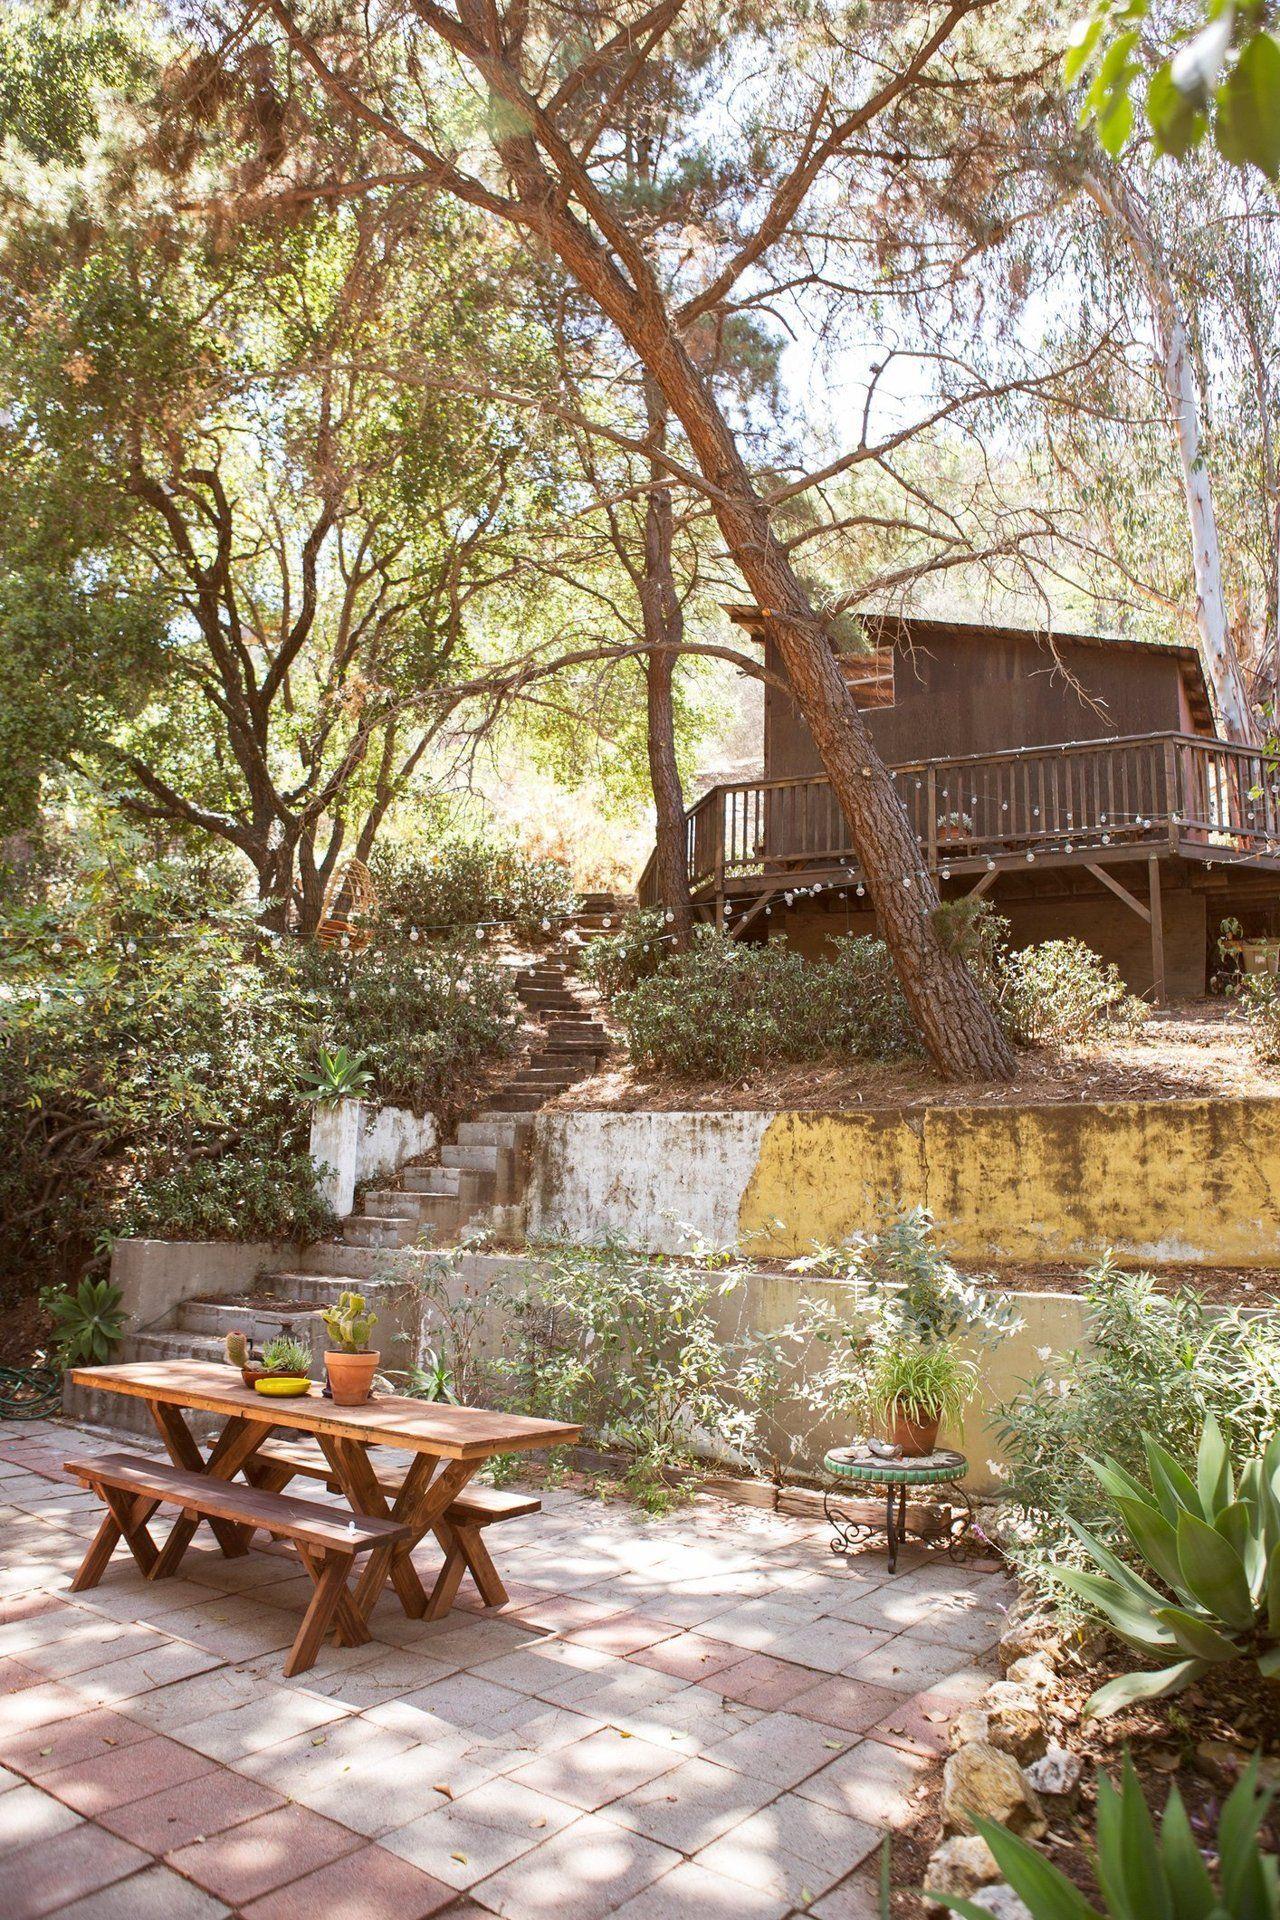 kristin u0026 derek u0027s musical laurel canyon lodge u2014 house tour house